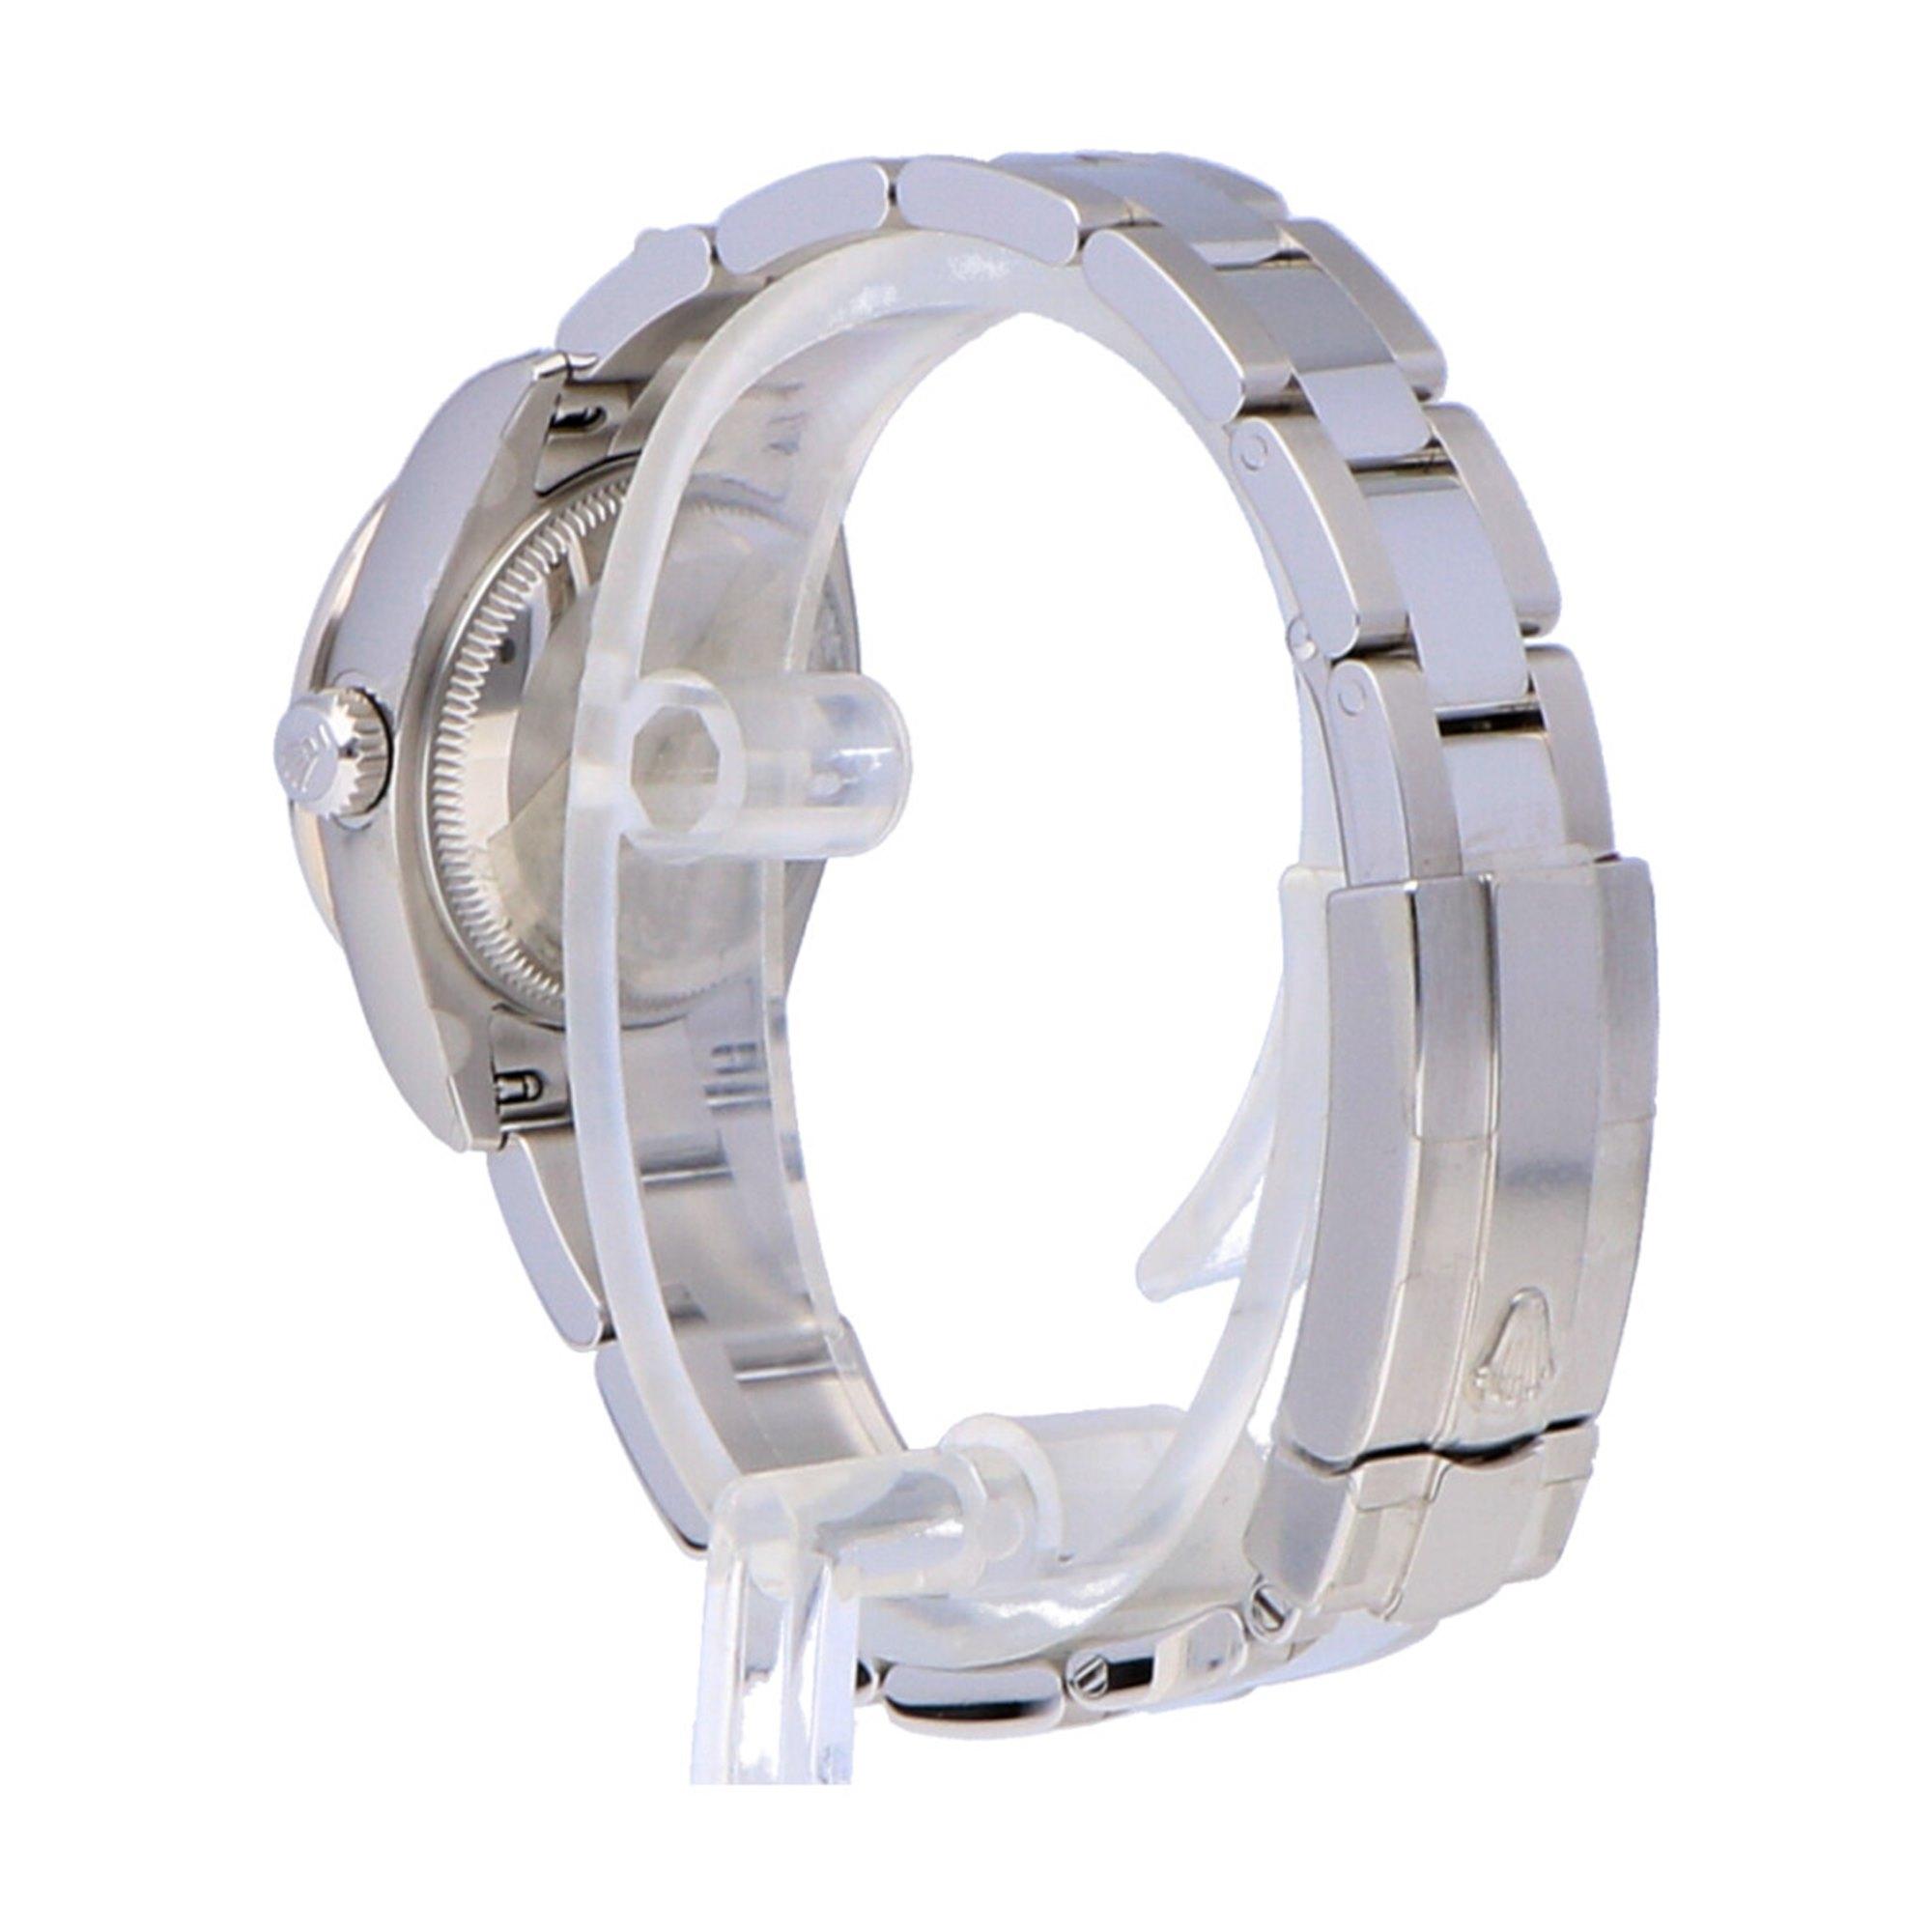 Rolex Datejust Stainless Steel 179384-0002